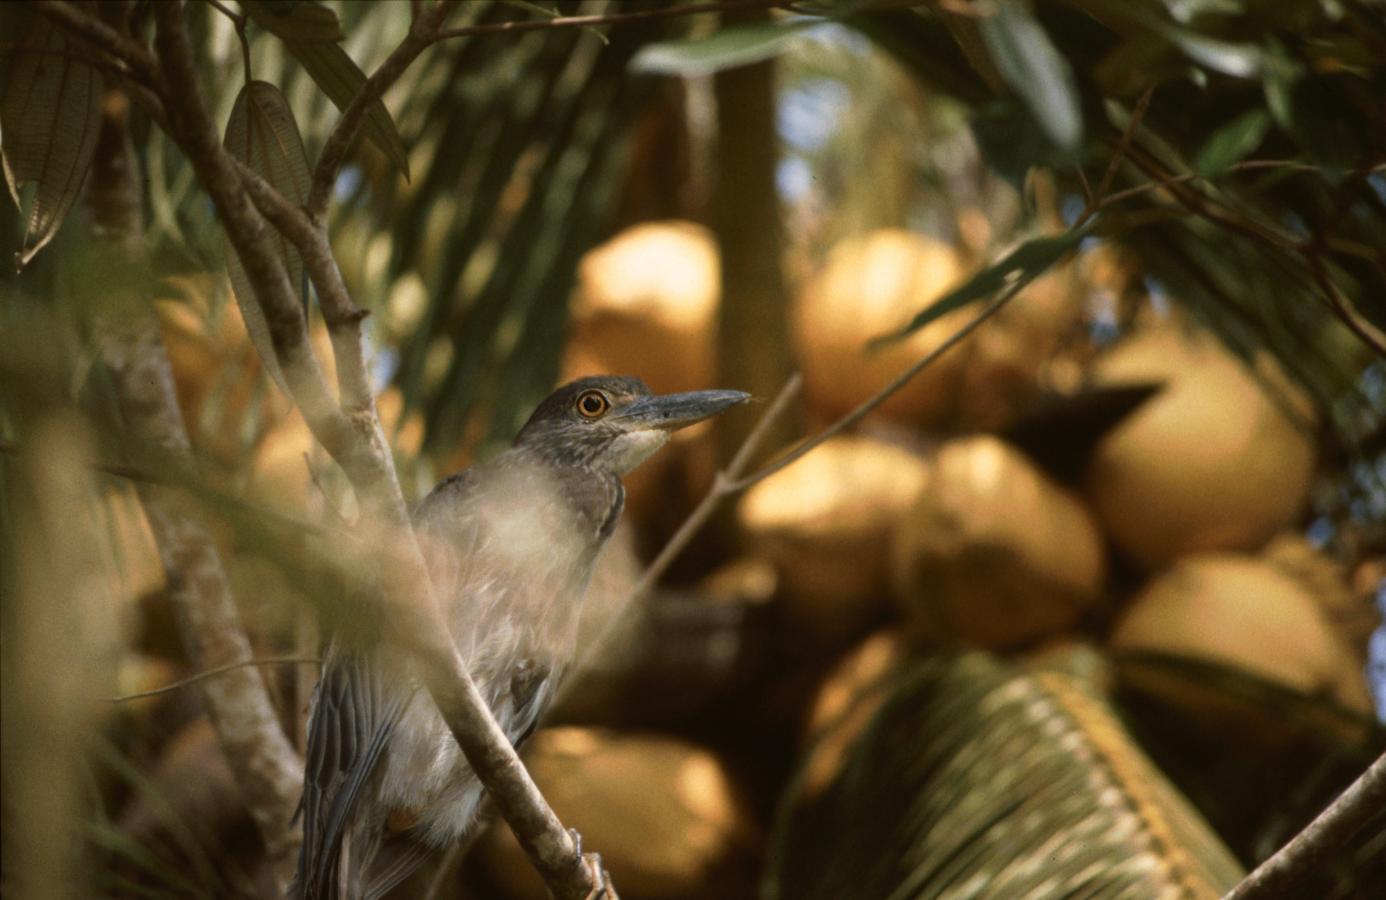 bird-costa-rica-2000